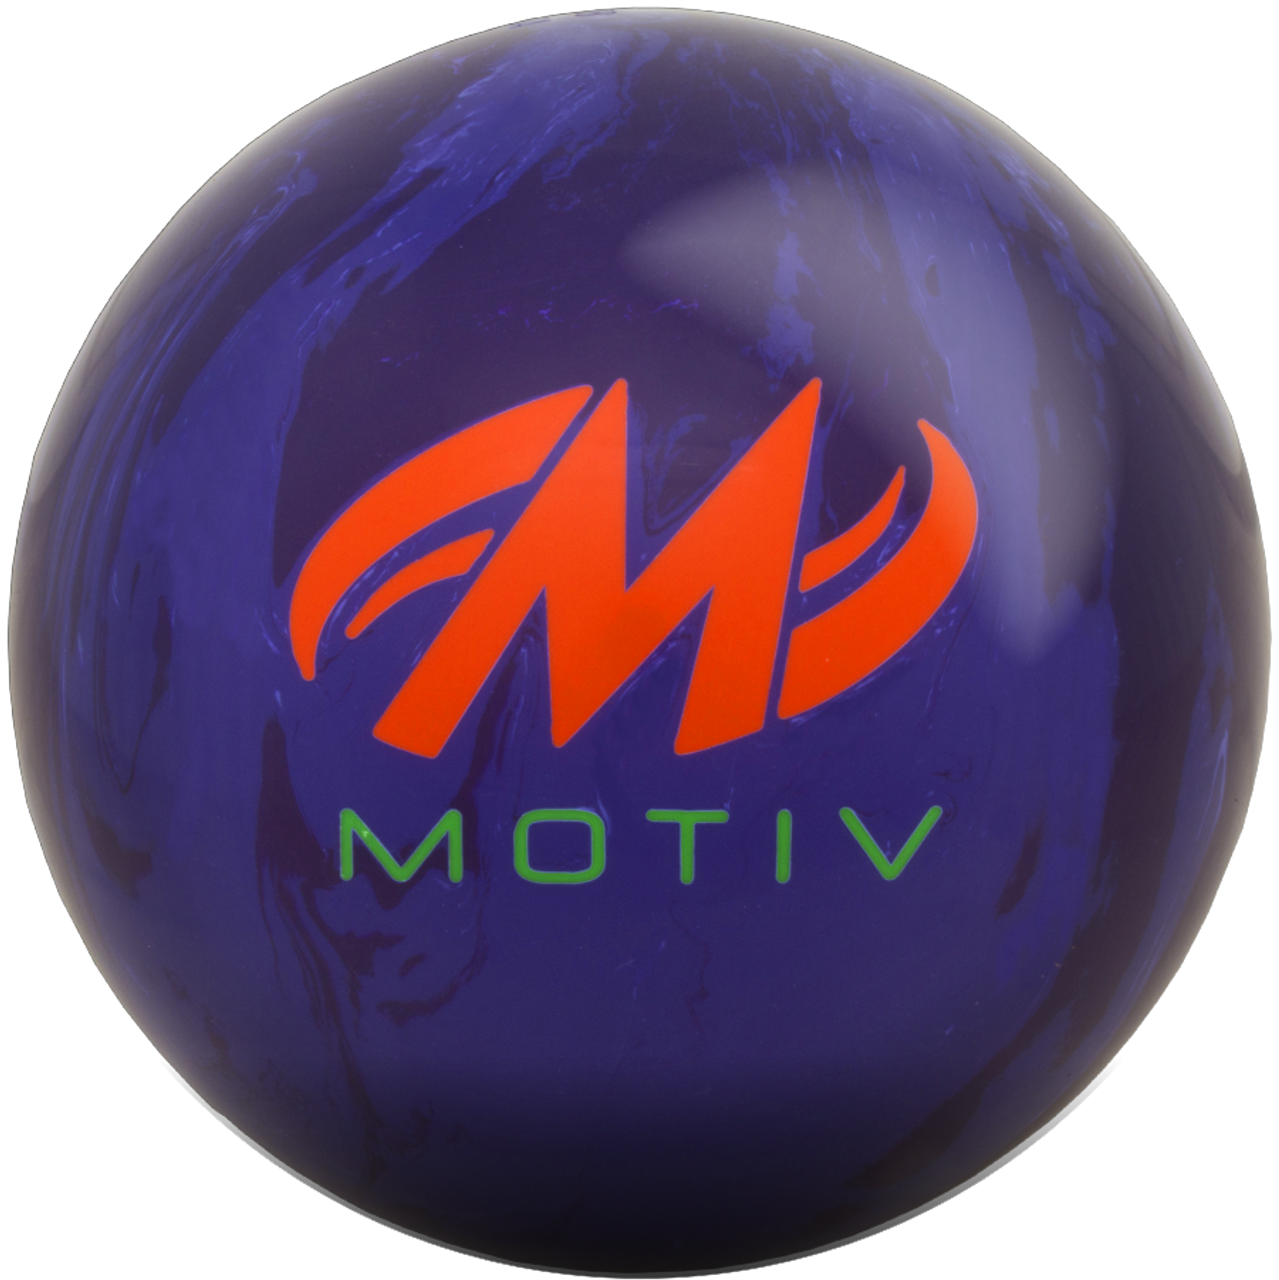 Motiv Venom Shock Bowling Ball Logo